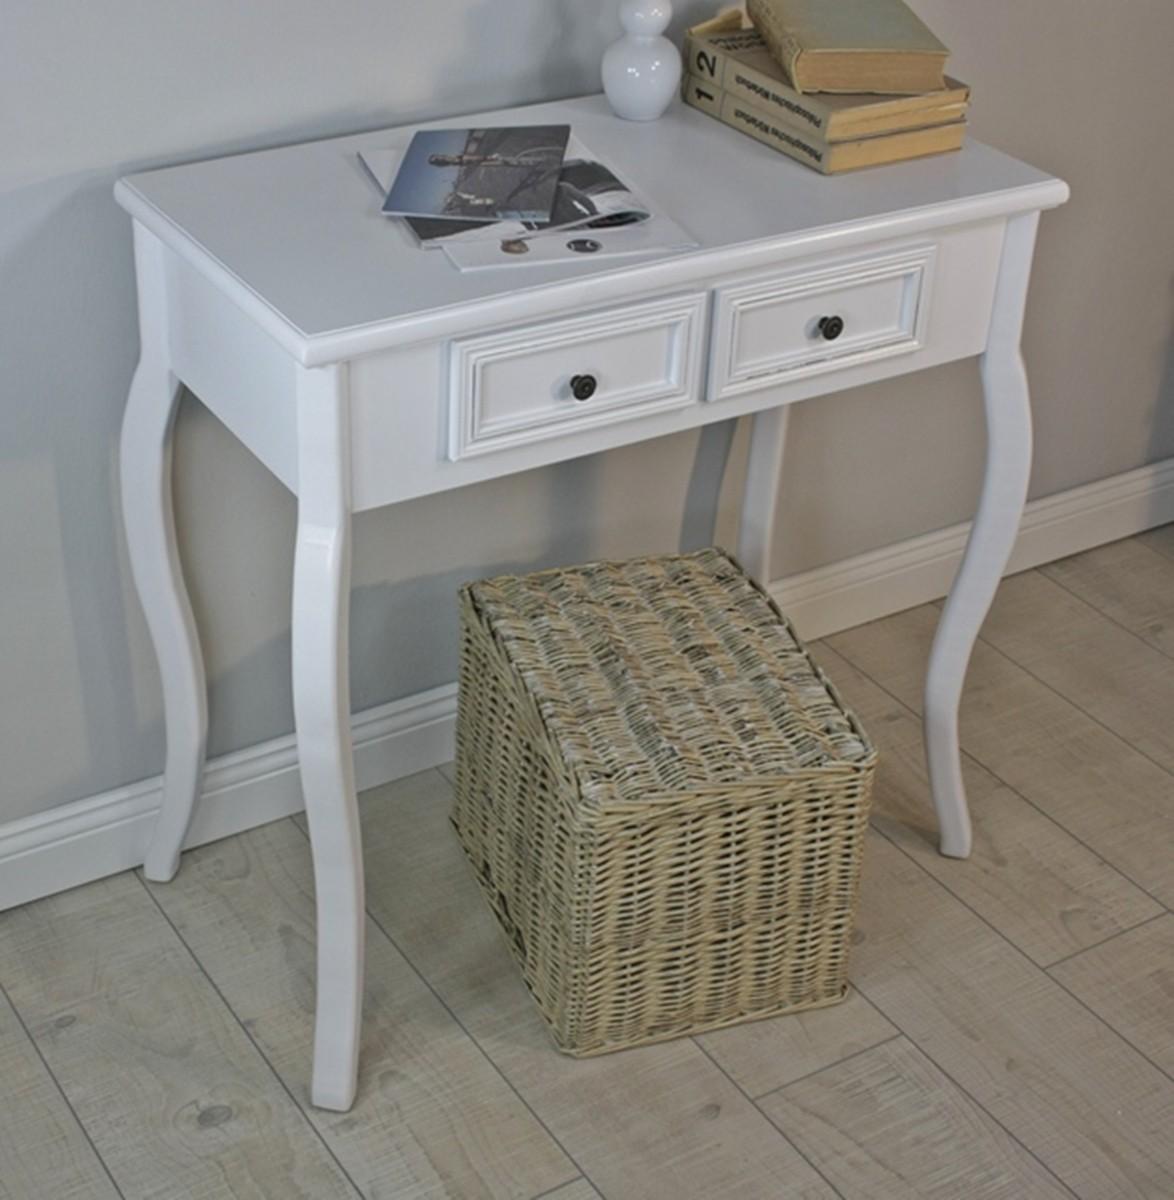 konsolentisch holz wei landhaus. Black Bedroom Furniture Sets. Home Design Ideas